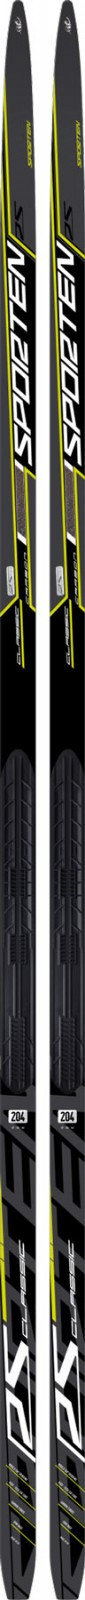 Sporten RS Classic - Cold